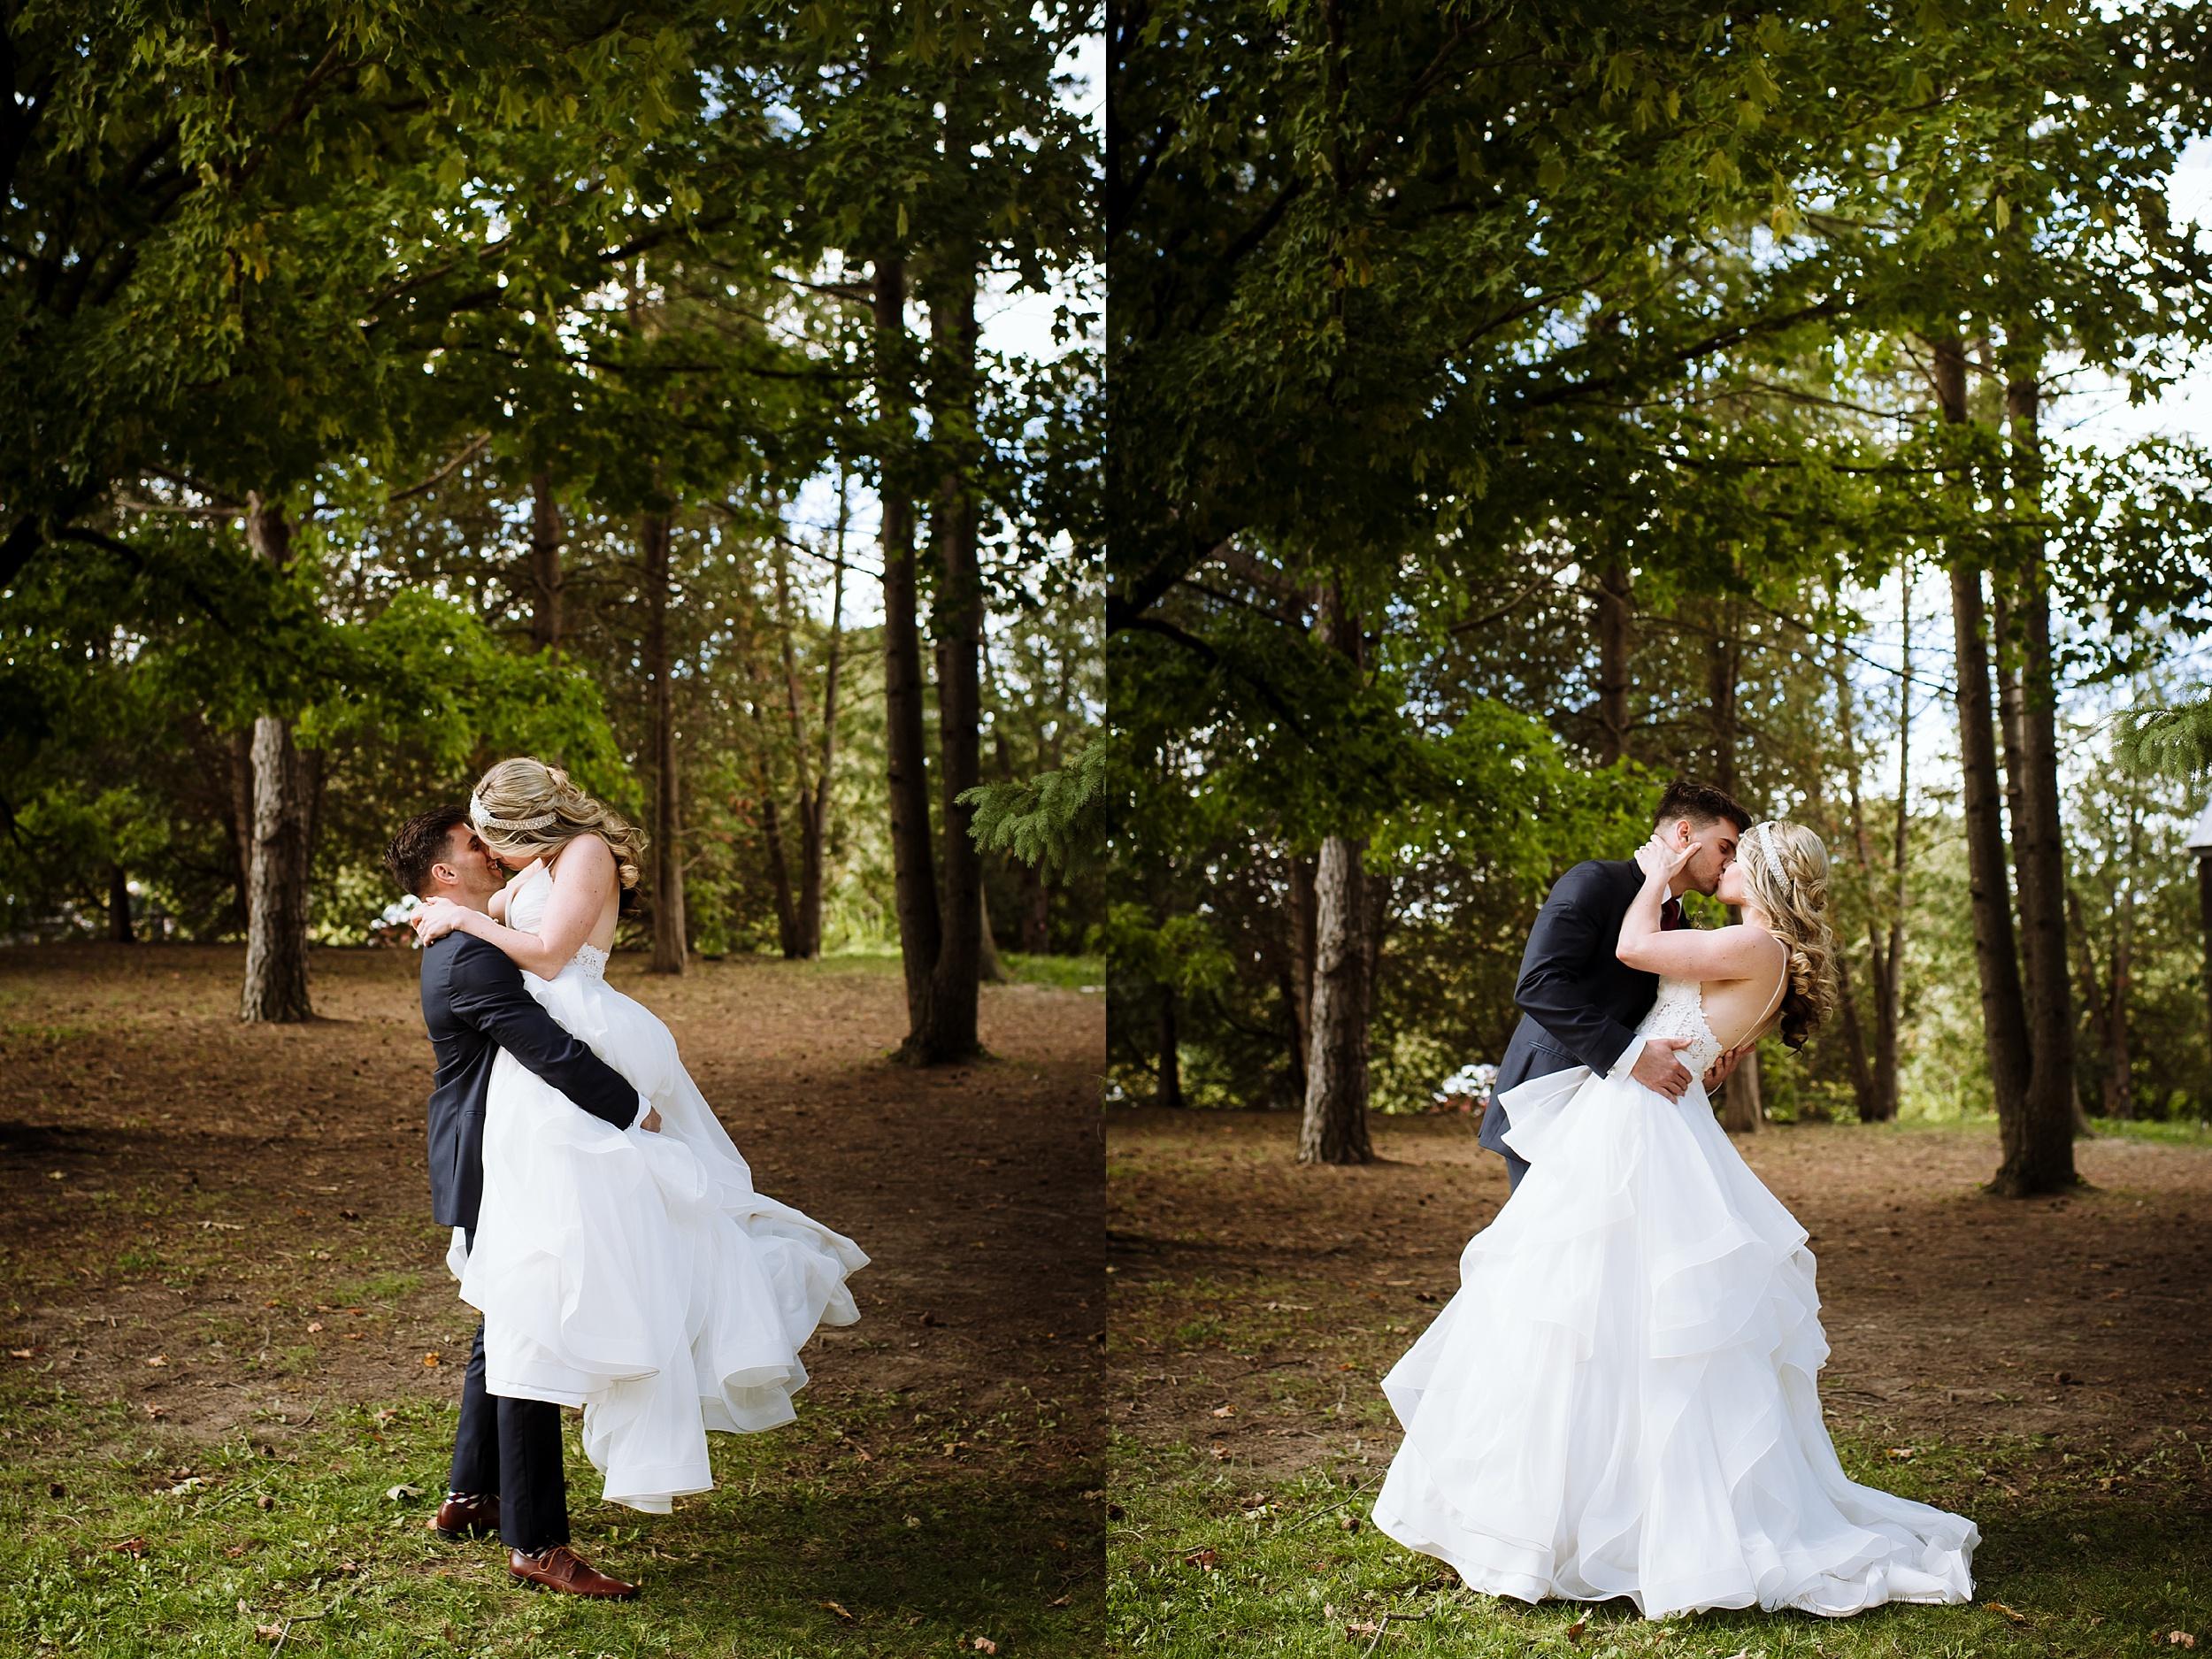 McMichael_Art_Collection_Wedding_chateau_le_jardin_Justine_Munro_Toronto_Photographer024.jpg